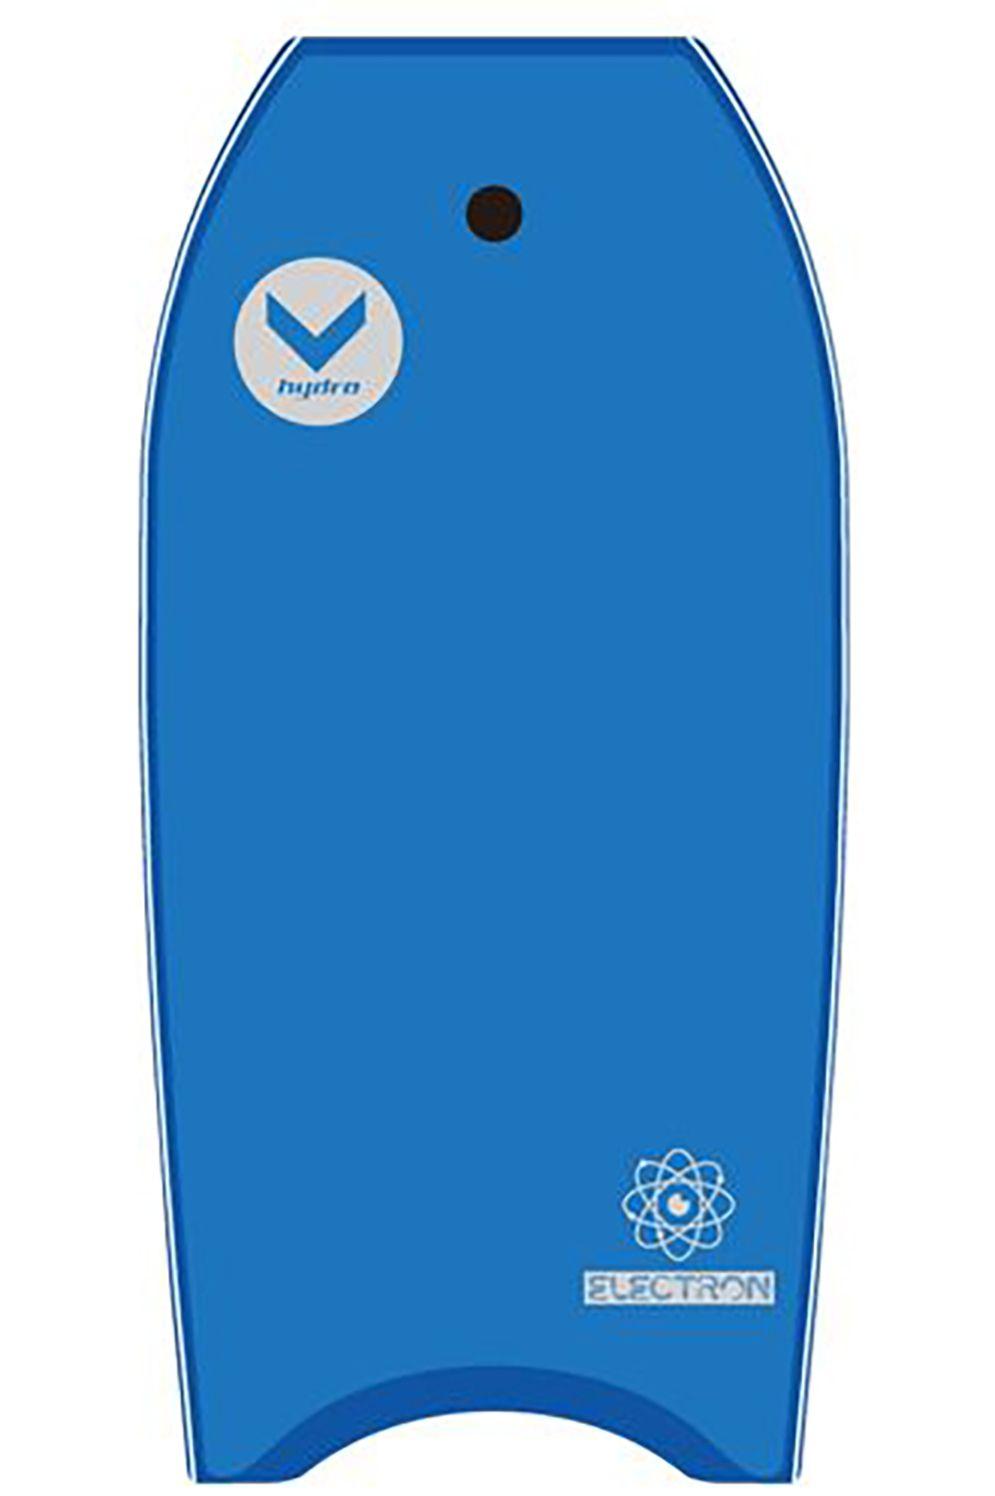 "Hydro Bodyboard Board 38"" HYDRO ELECTRON Light Blue"